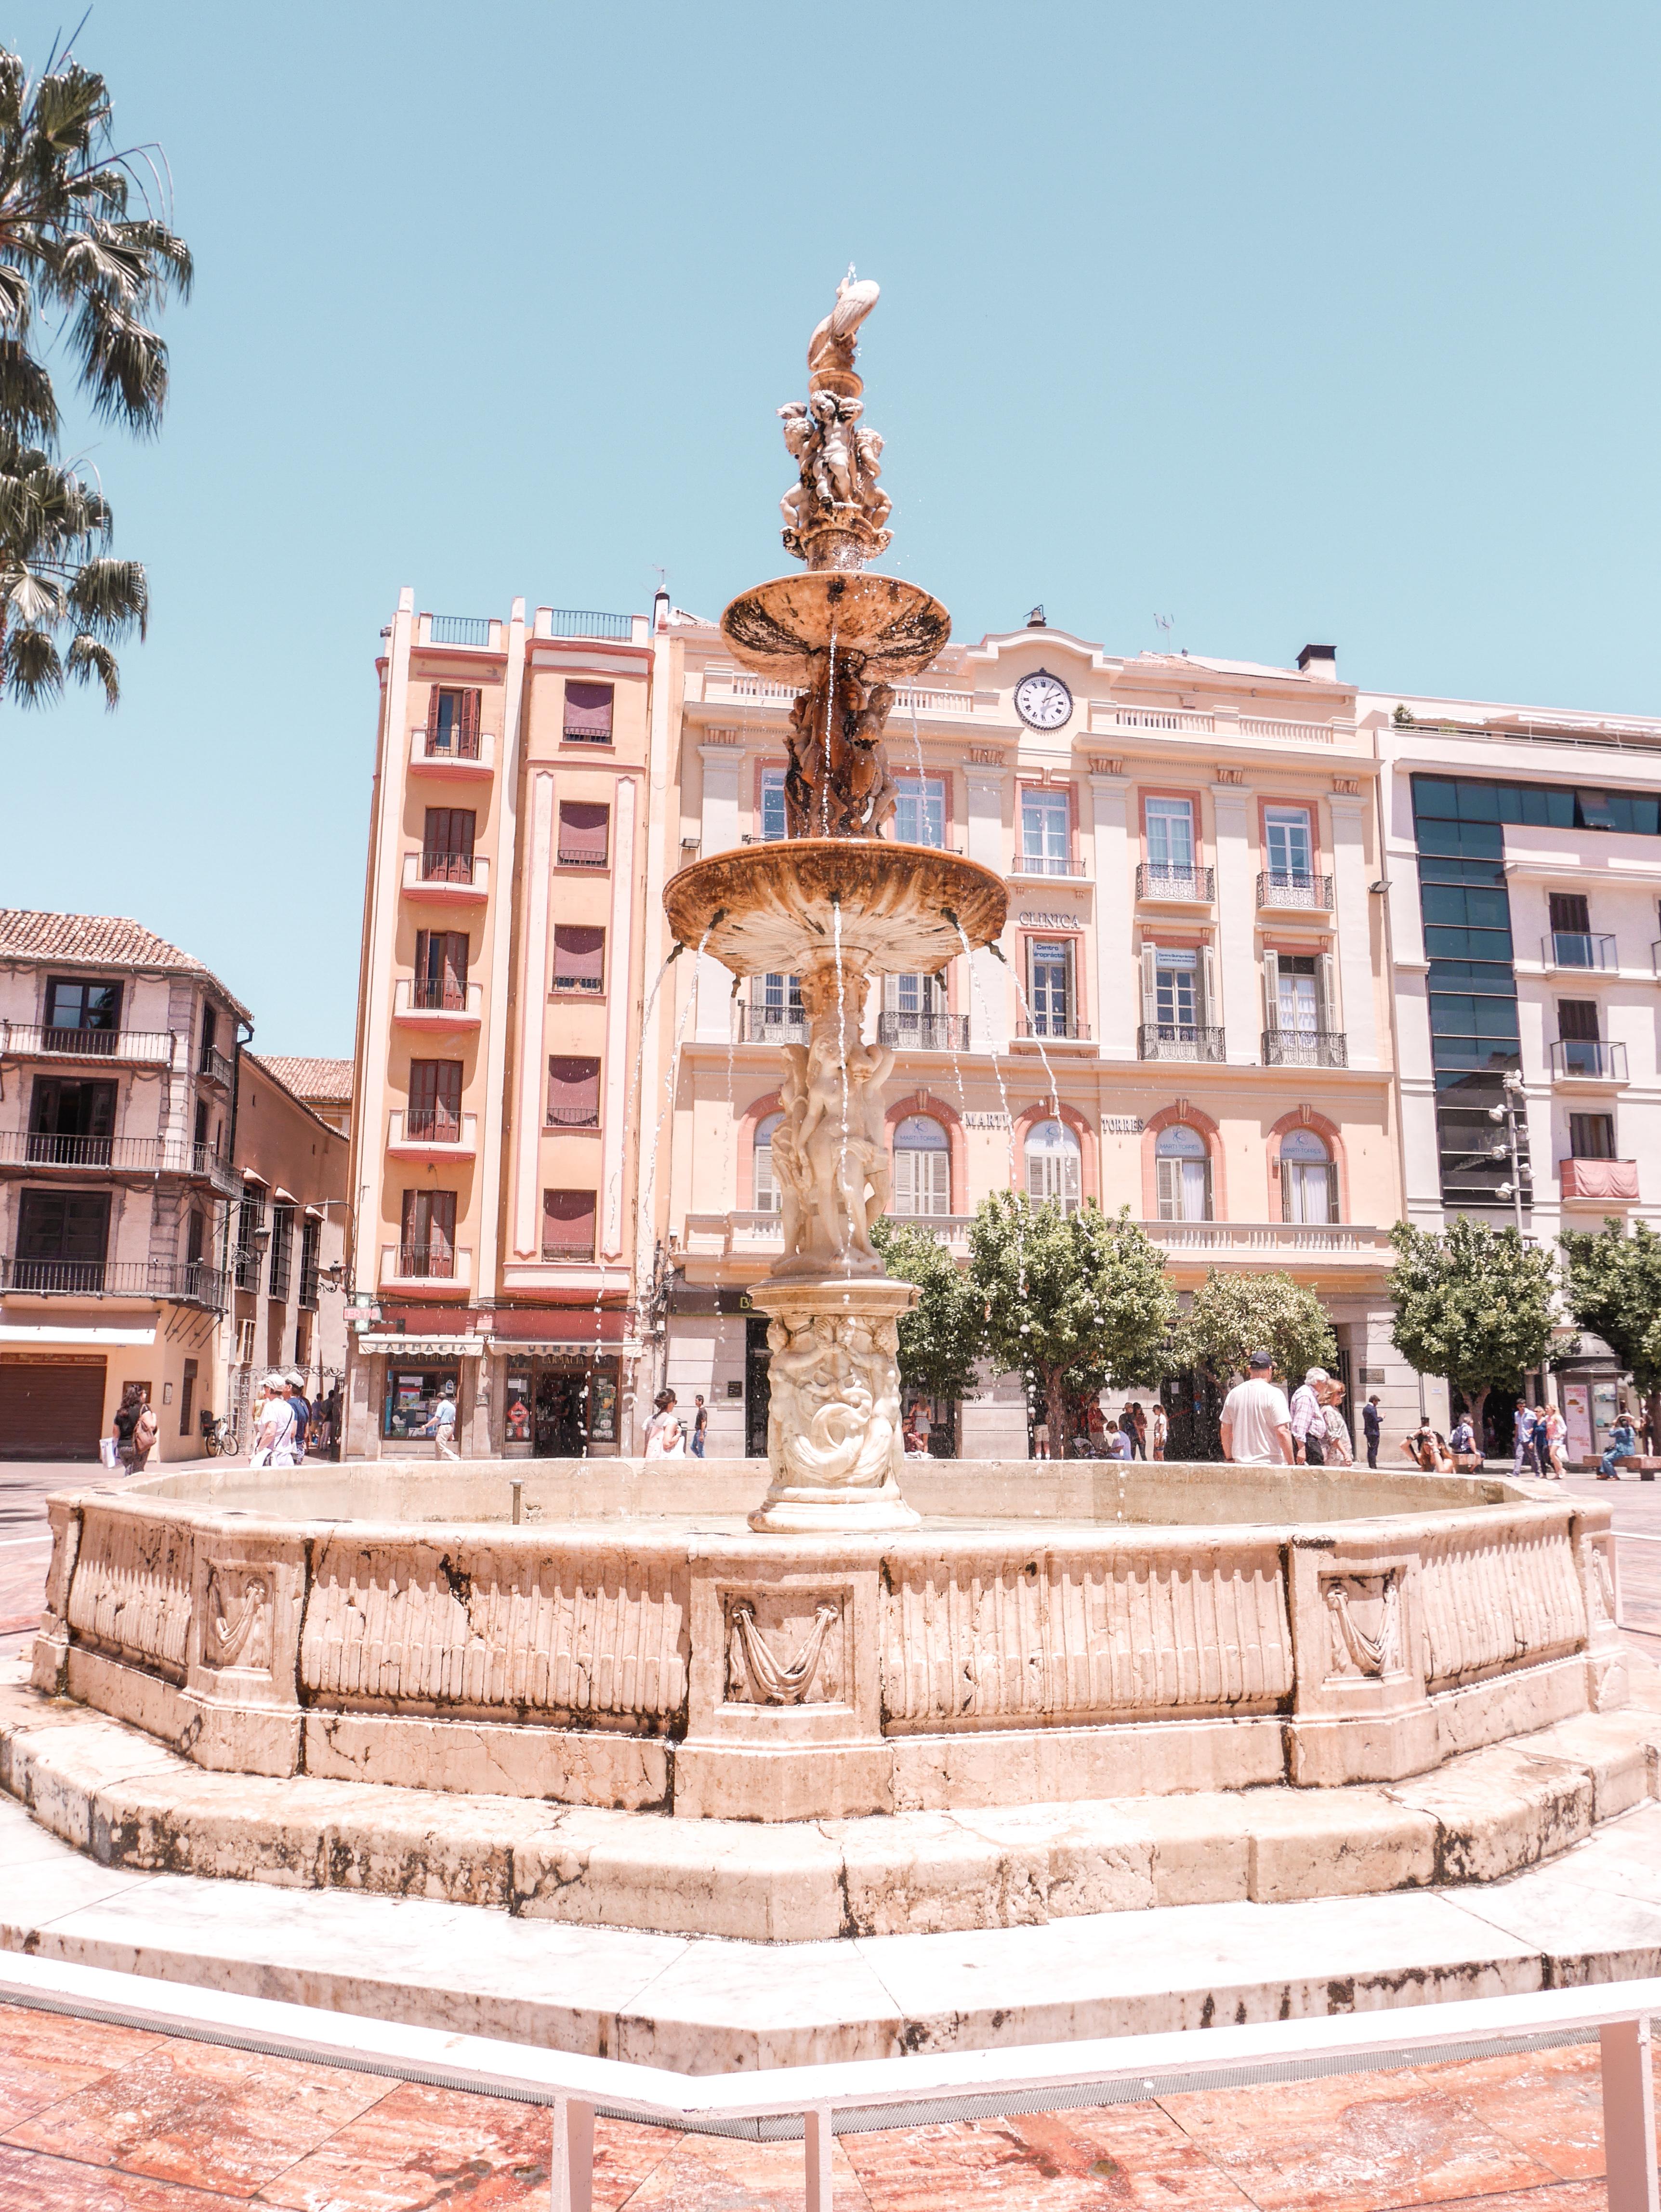 Plaza de la Constitution kokemuksia